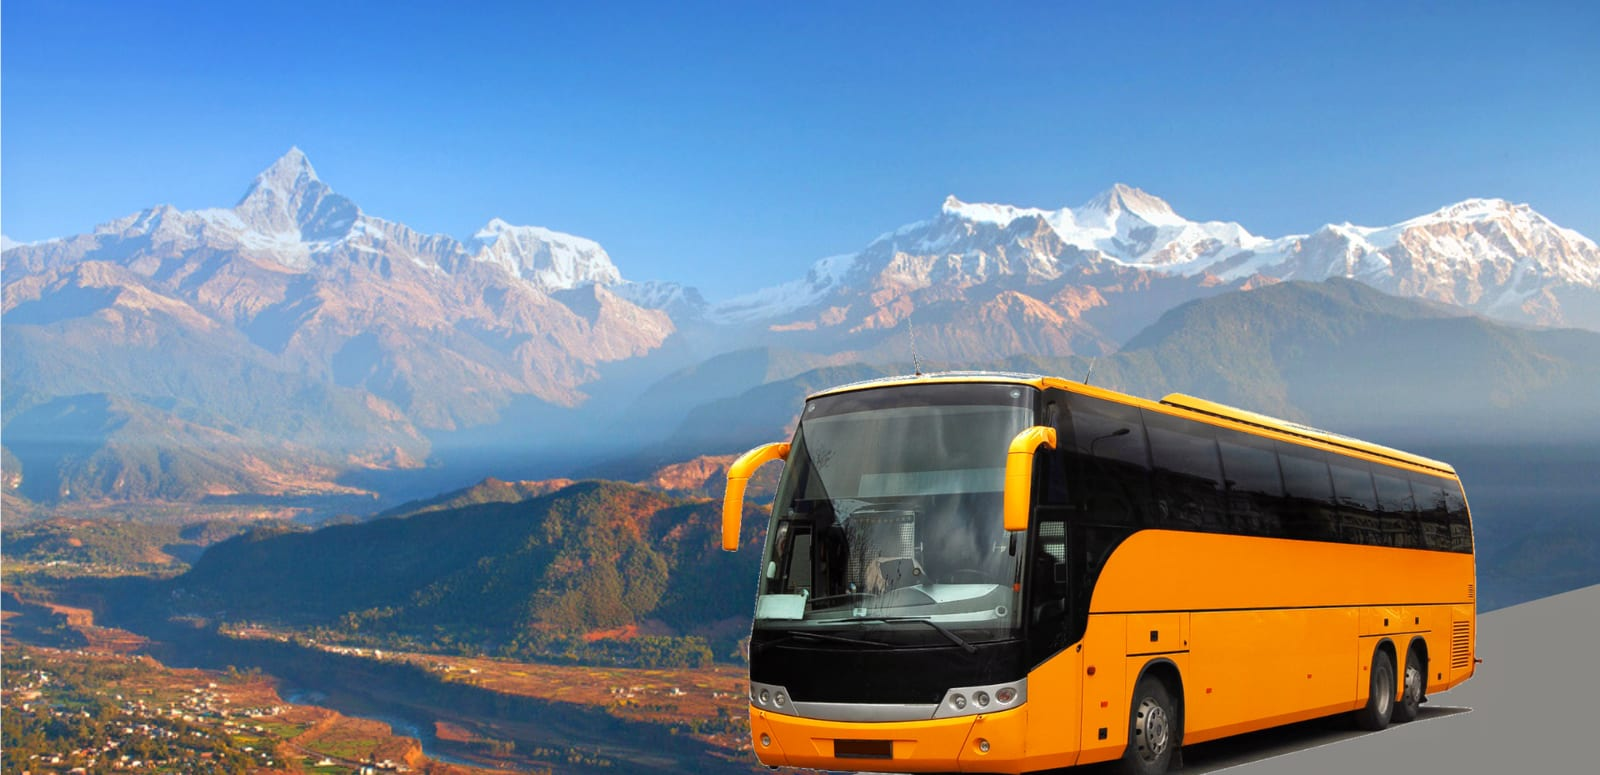 Kathmandu To Pokhara by Bus